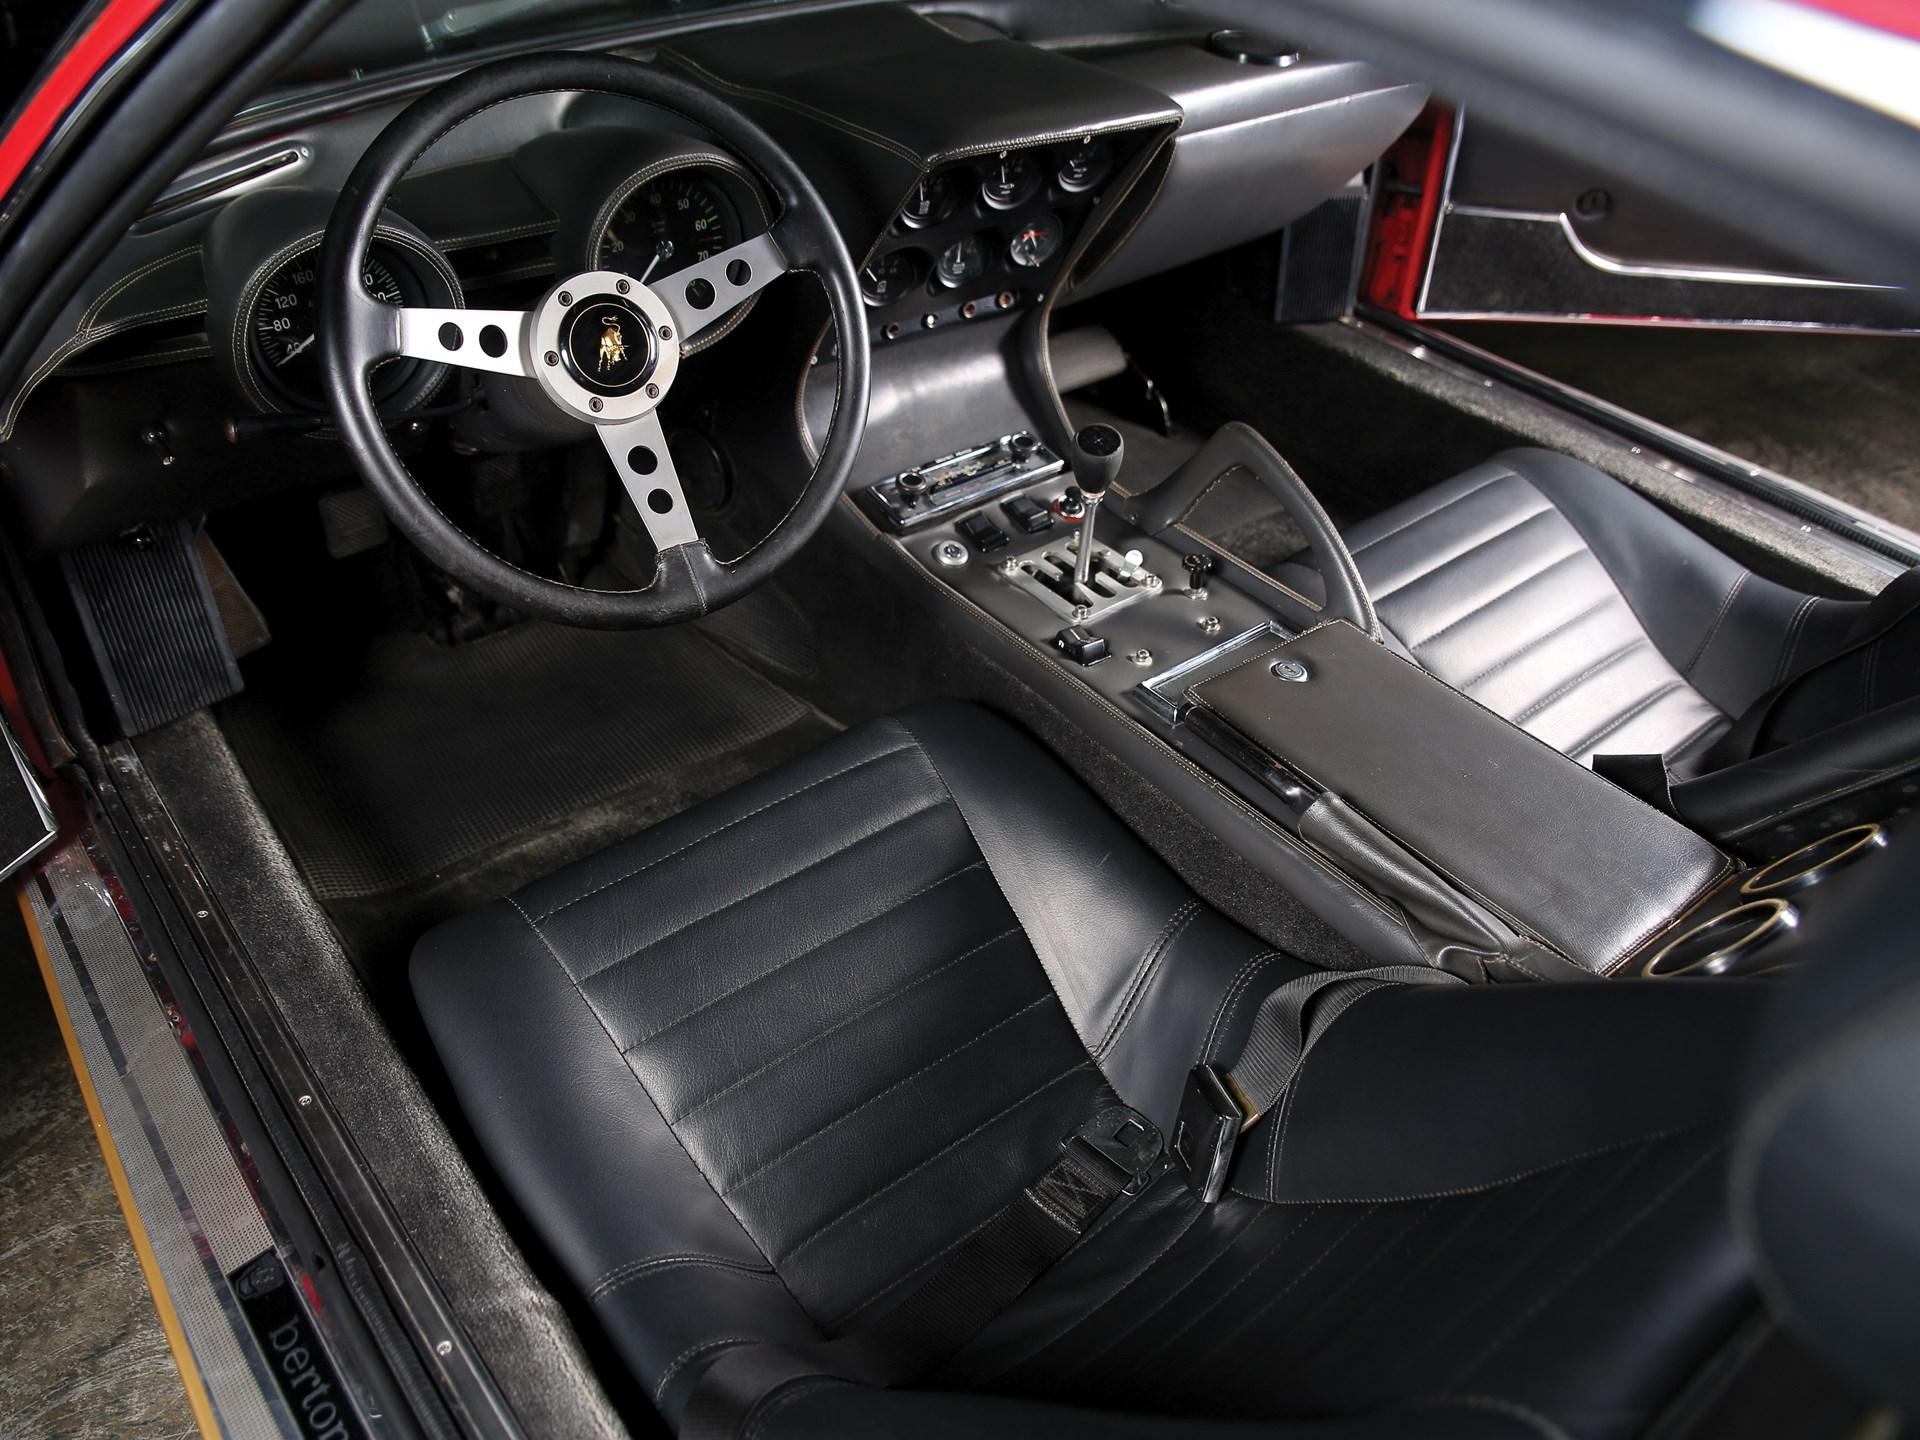 Rm Sotheby S 1972 Lamborghini Miura P400 Sv By Bertone Monterey 2016